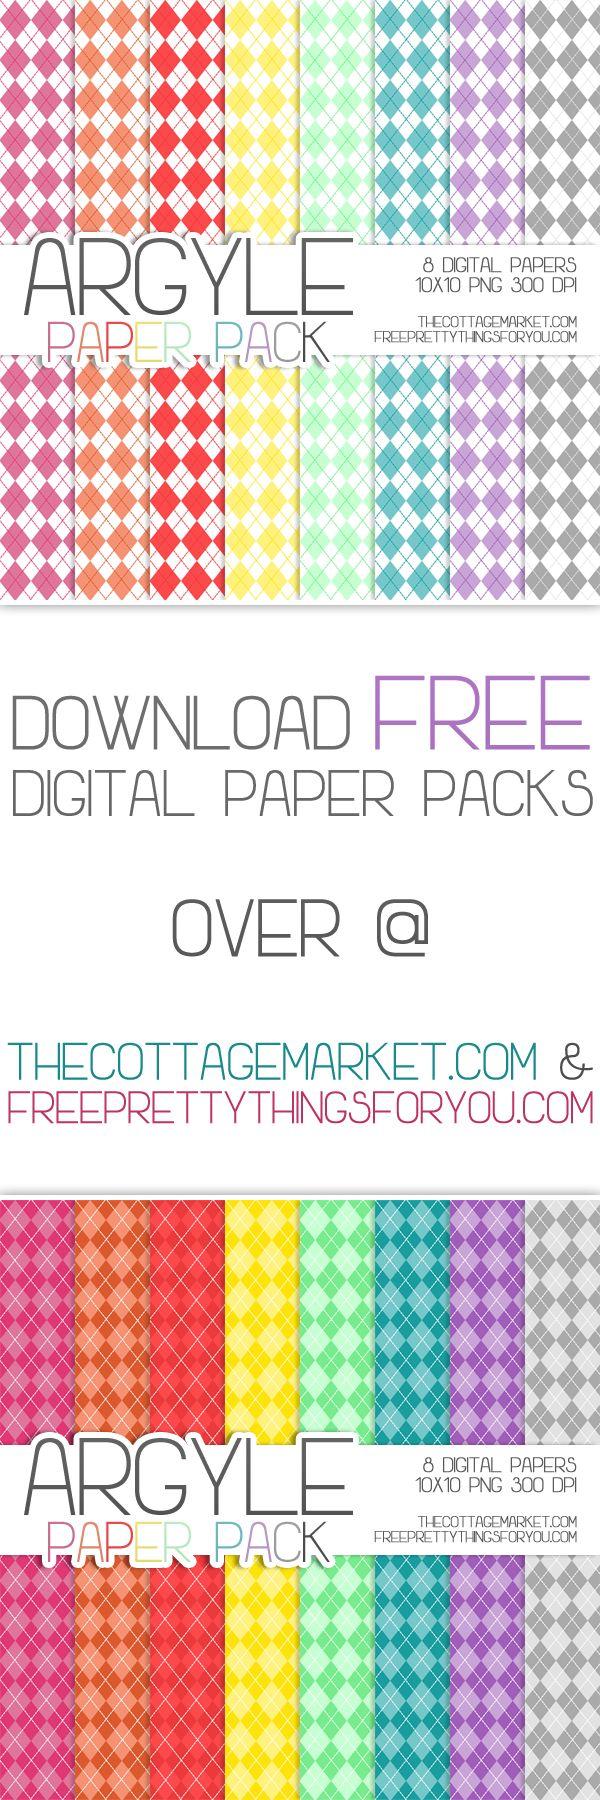 Free Argyle Digital Scrapbooking Paper Pack